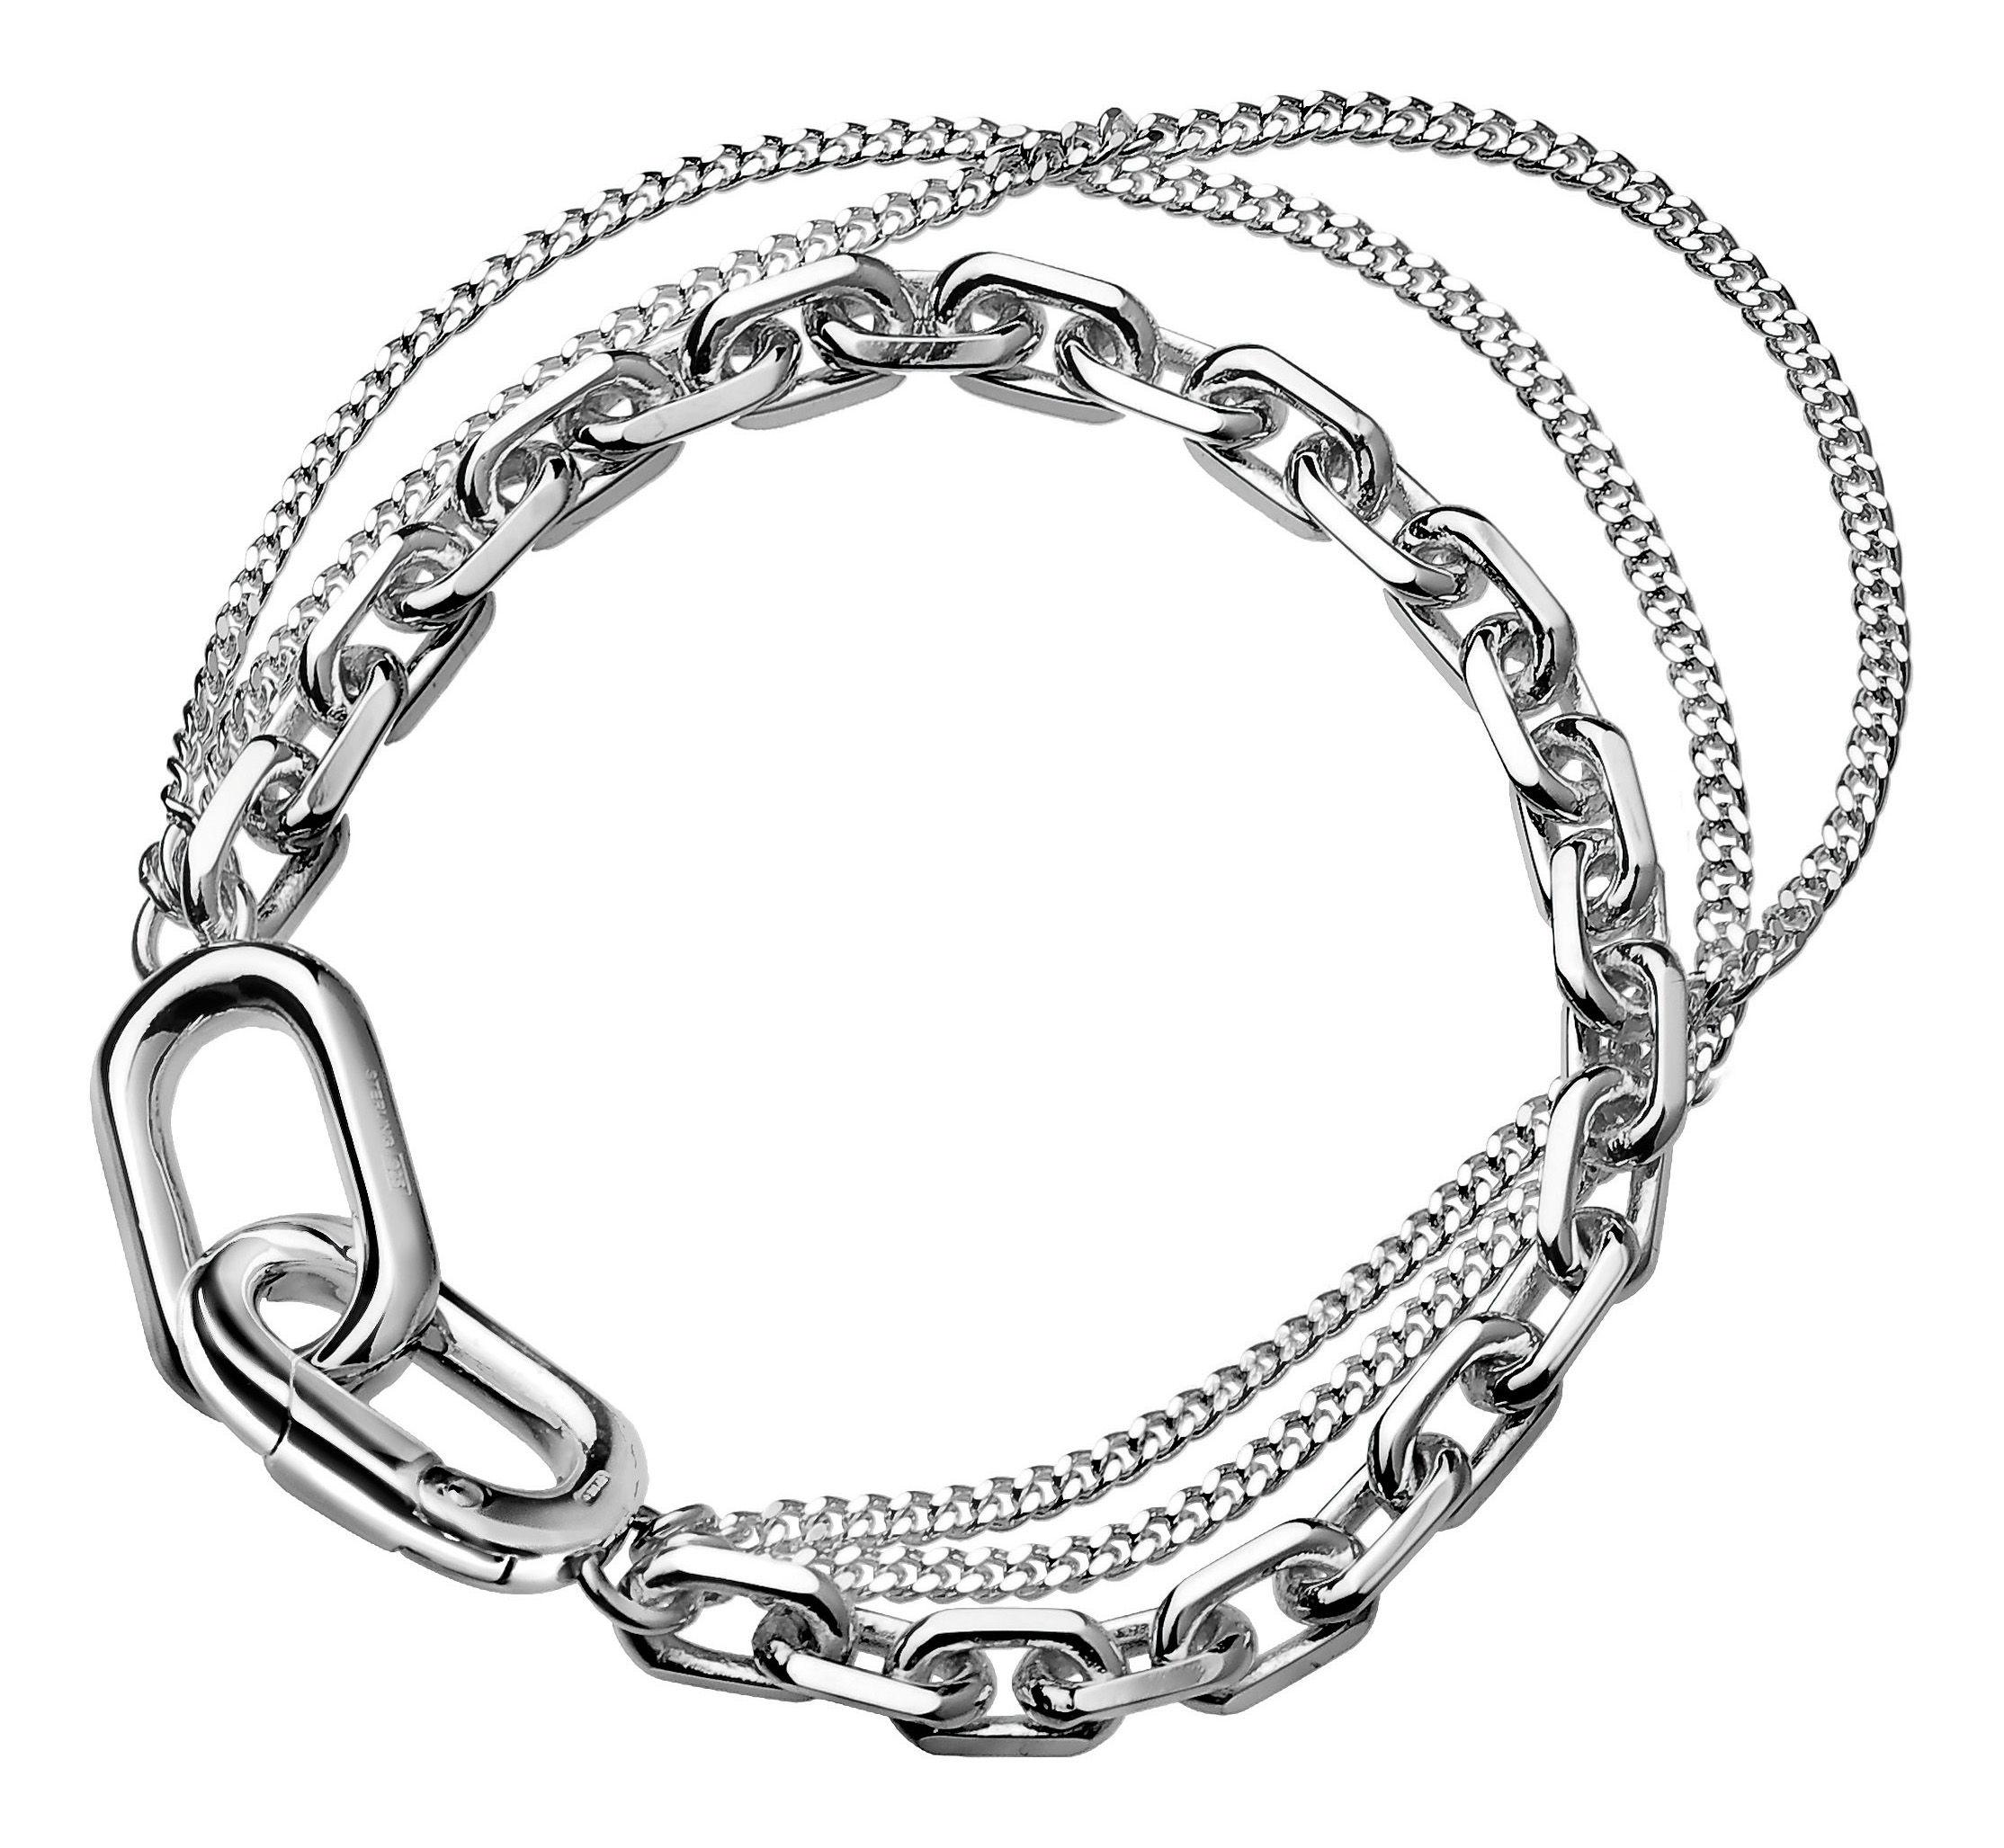 les enchain s 3 rangs bracelet by adeline cacheux small silver bracelet triple by christofle. Black Bedroom Furniture Sets. Home Design Ideas